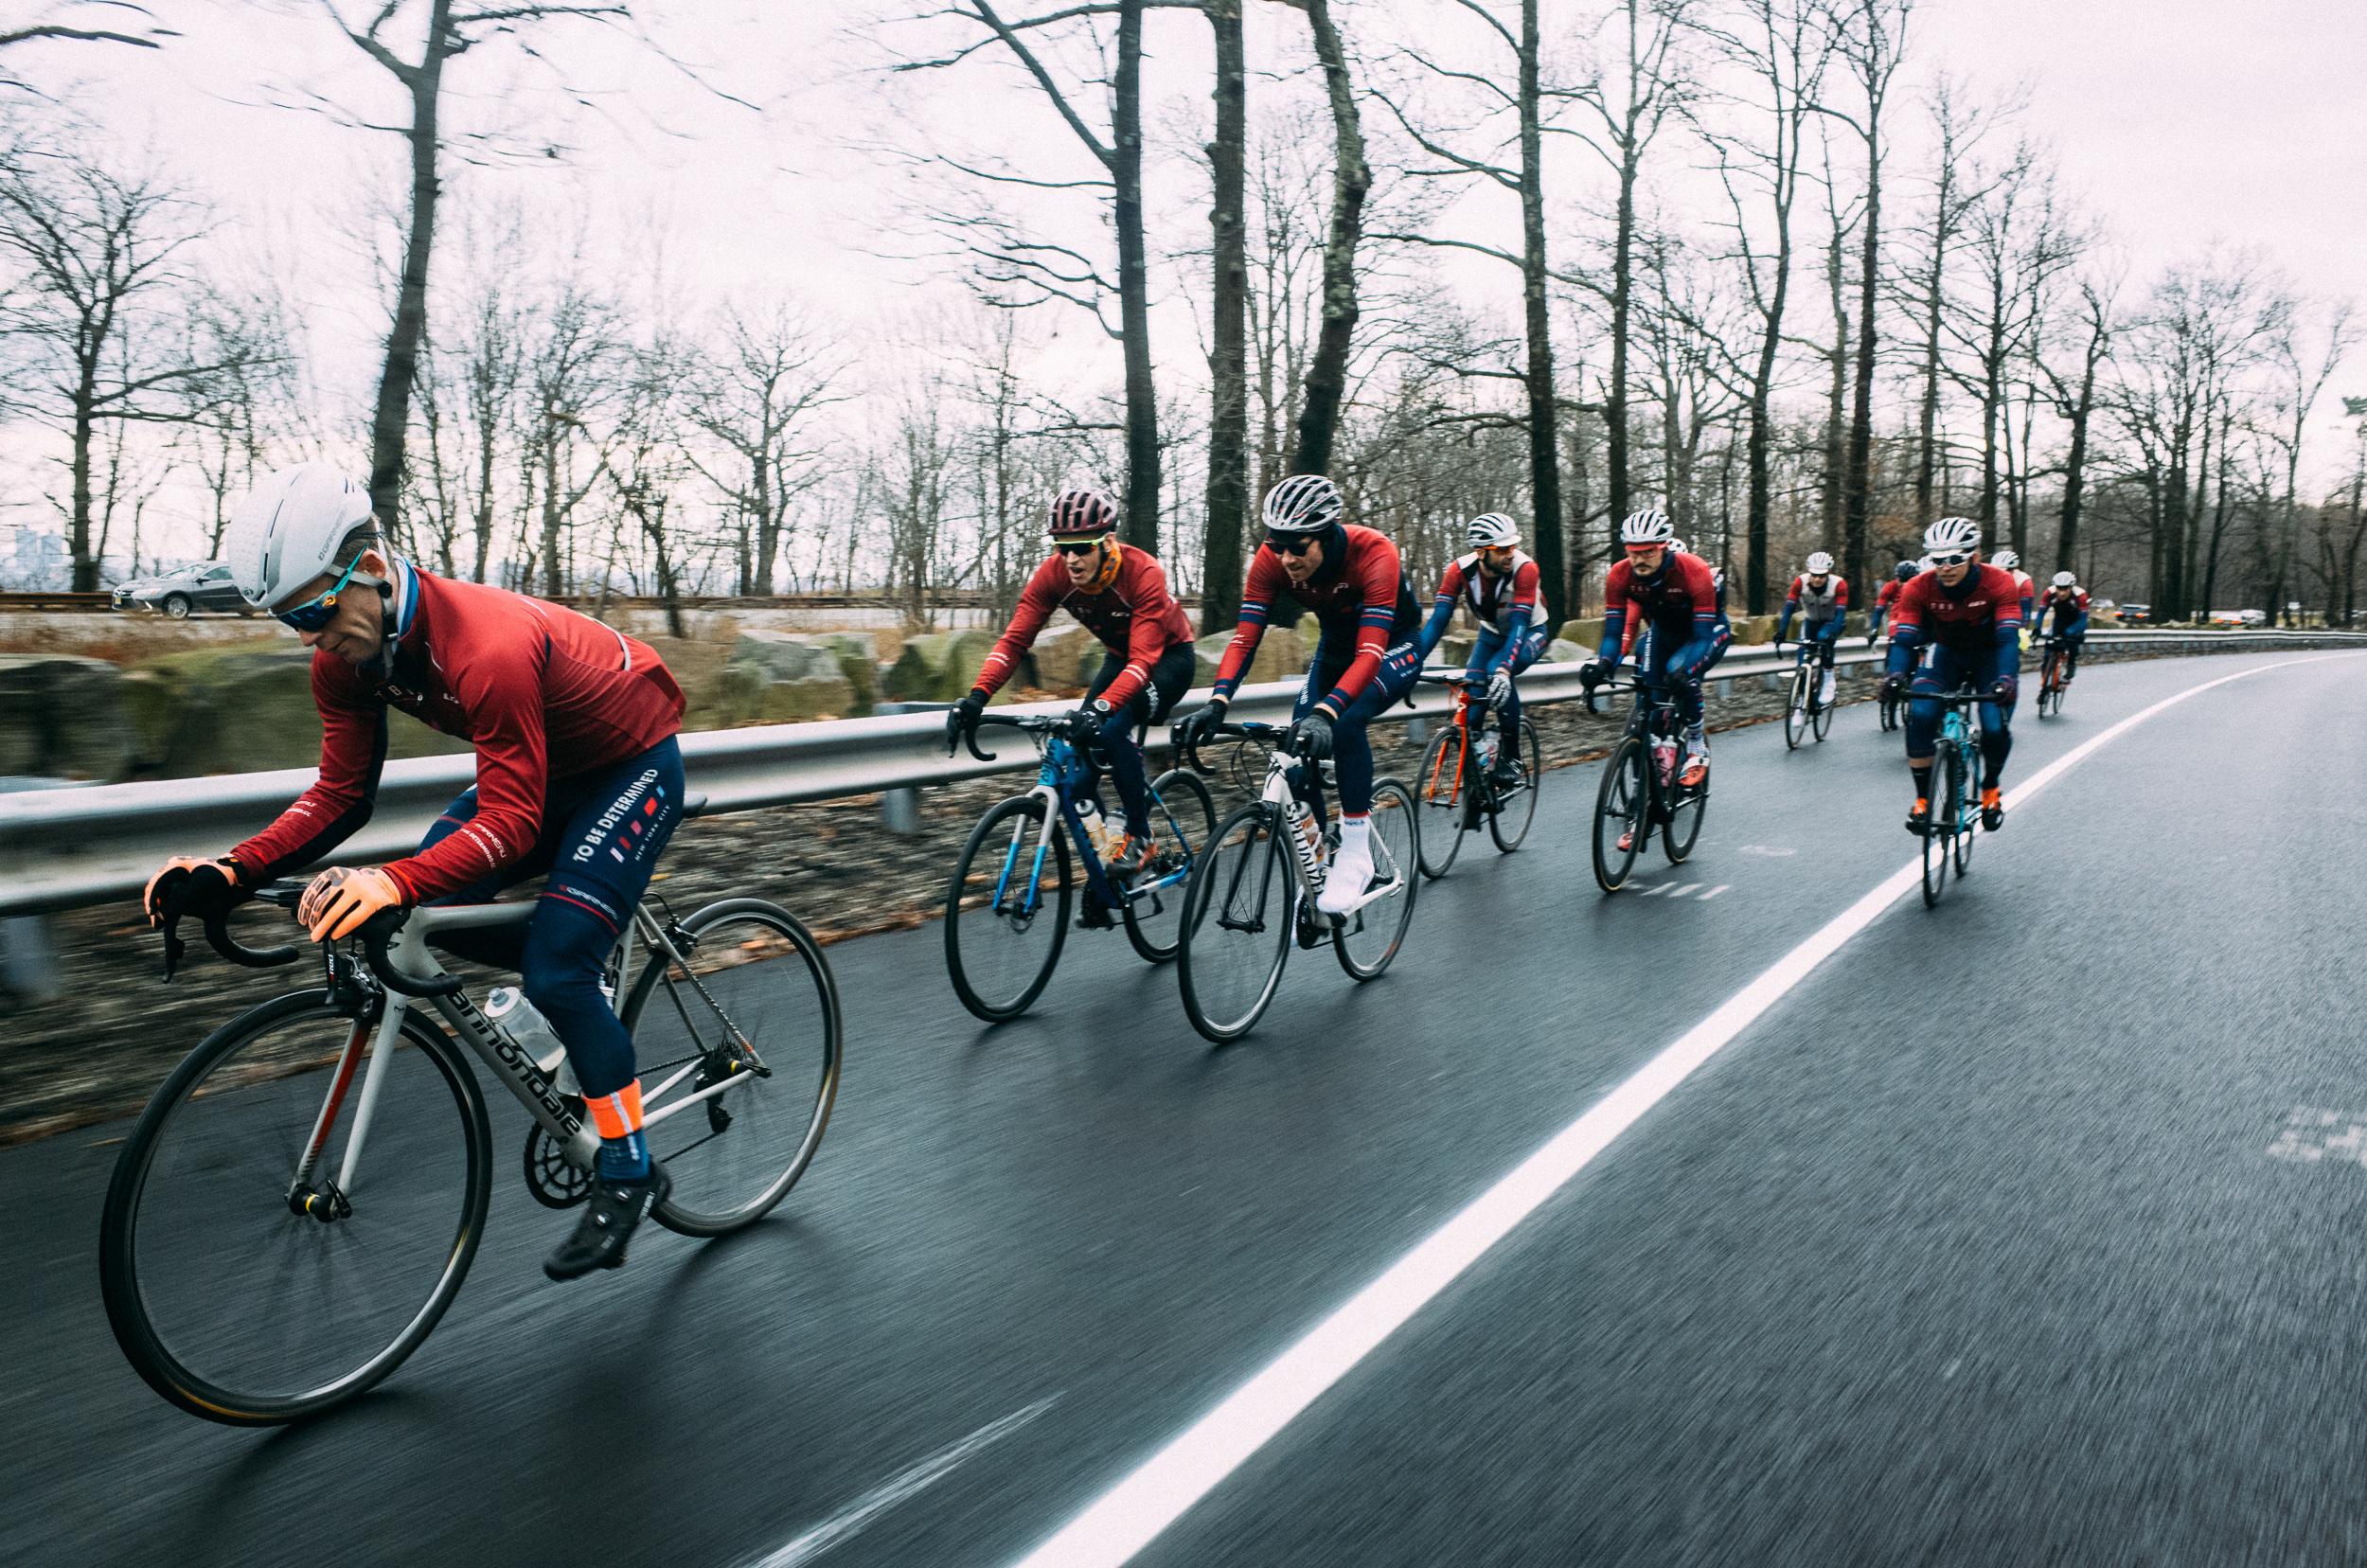 to-be-determined-photo-rhetoric-team-ride-january-1006.jpg